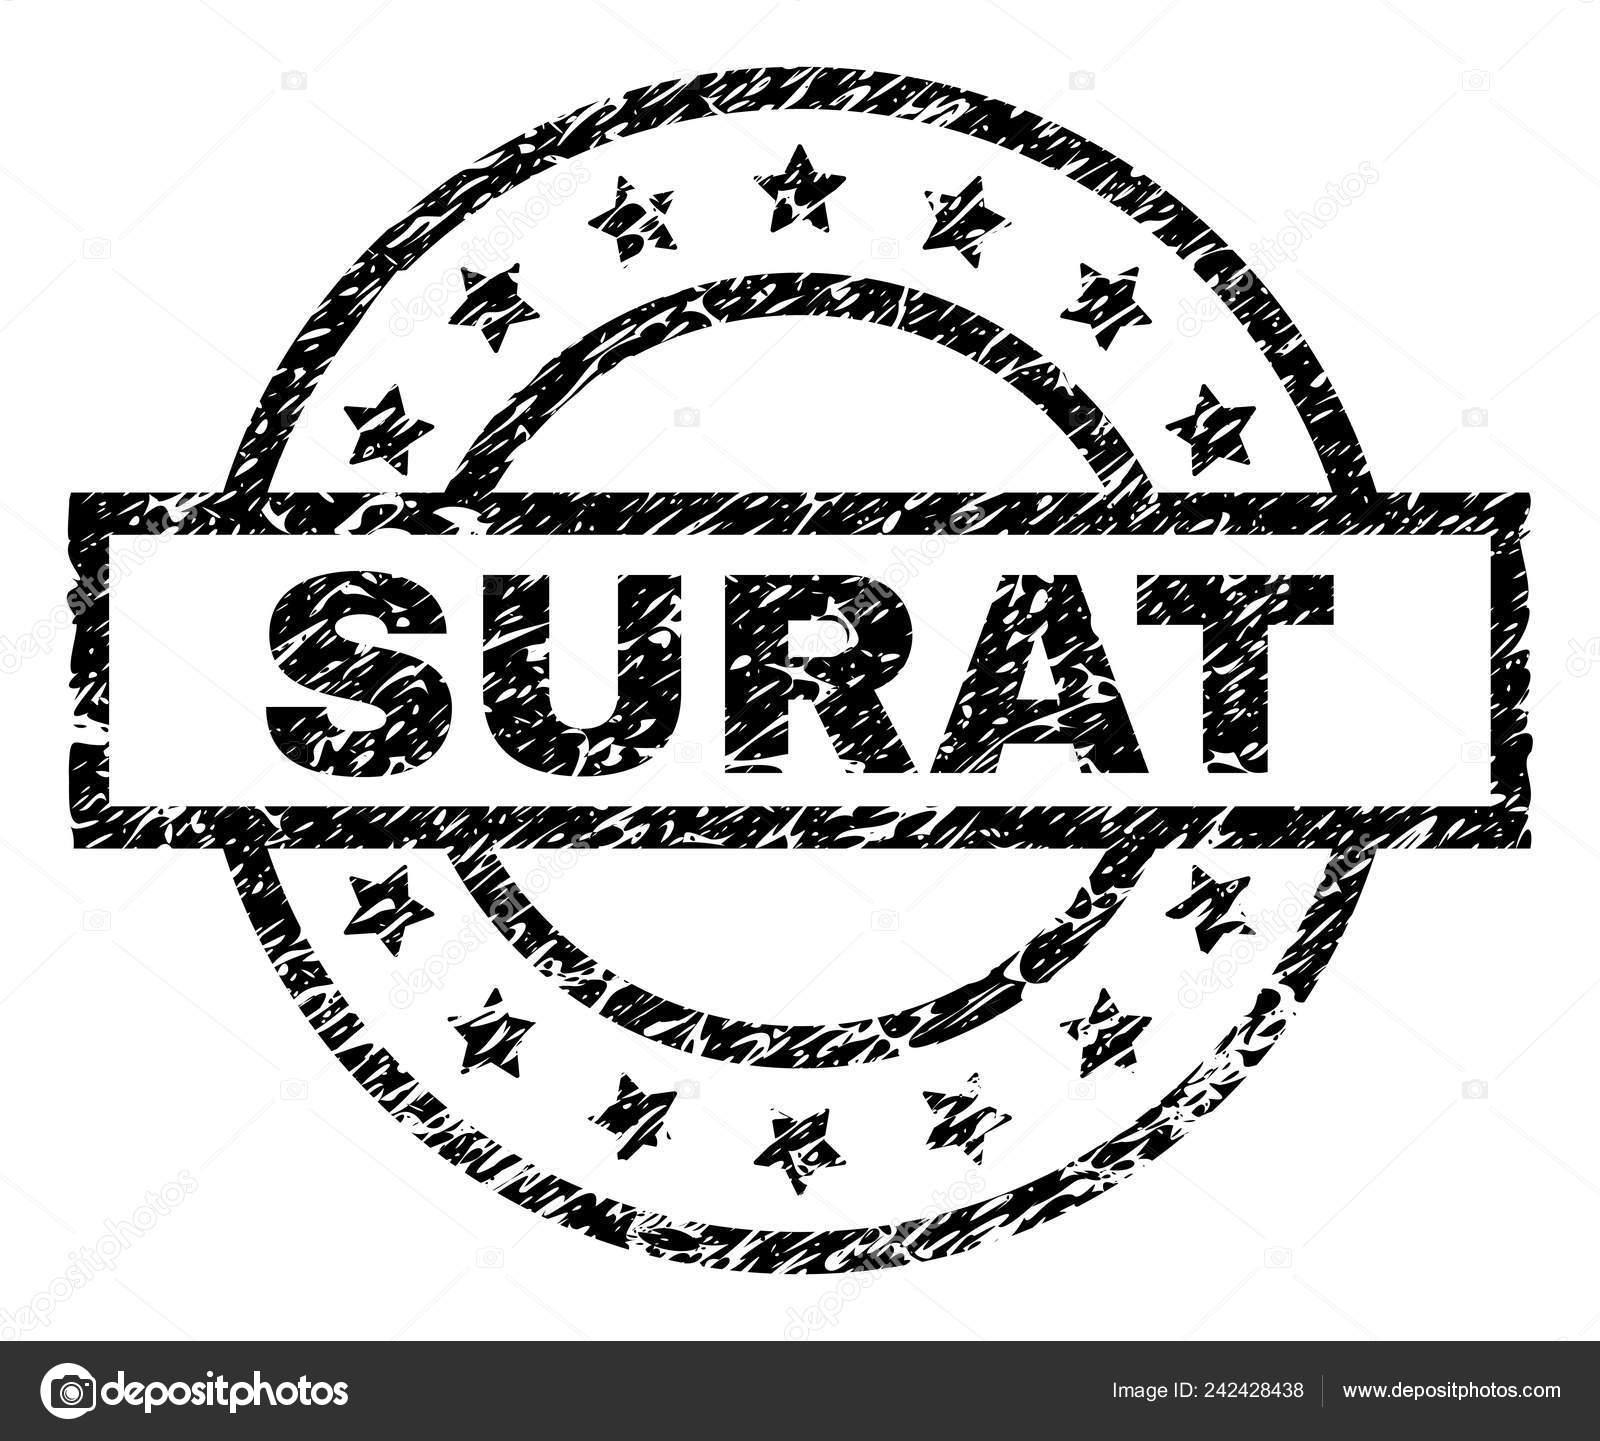 Surat Stamp Seal Watermark Distress Style Designed Rectangle